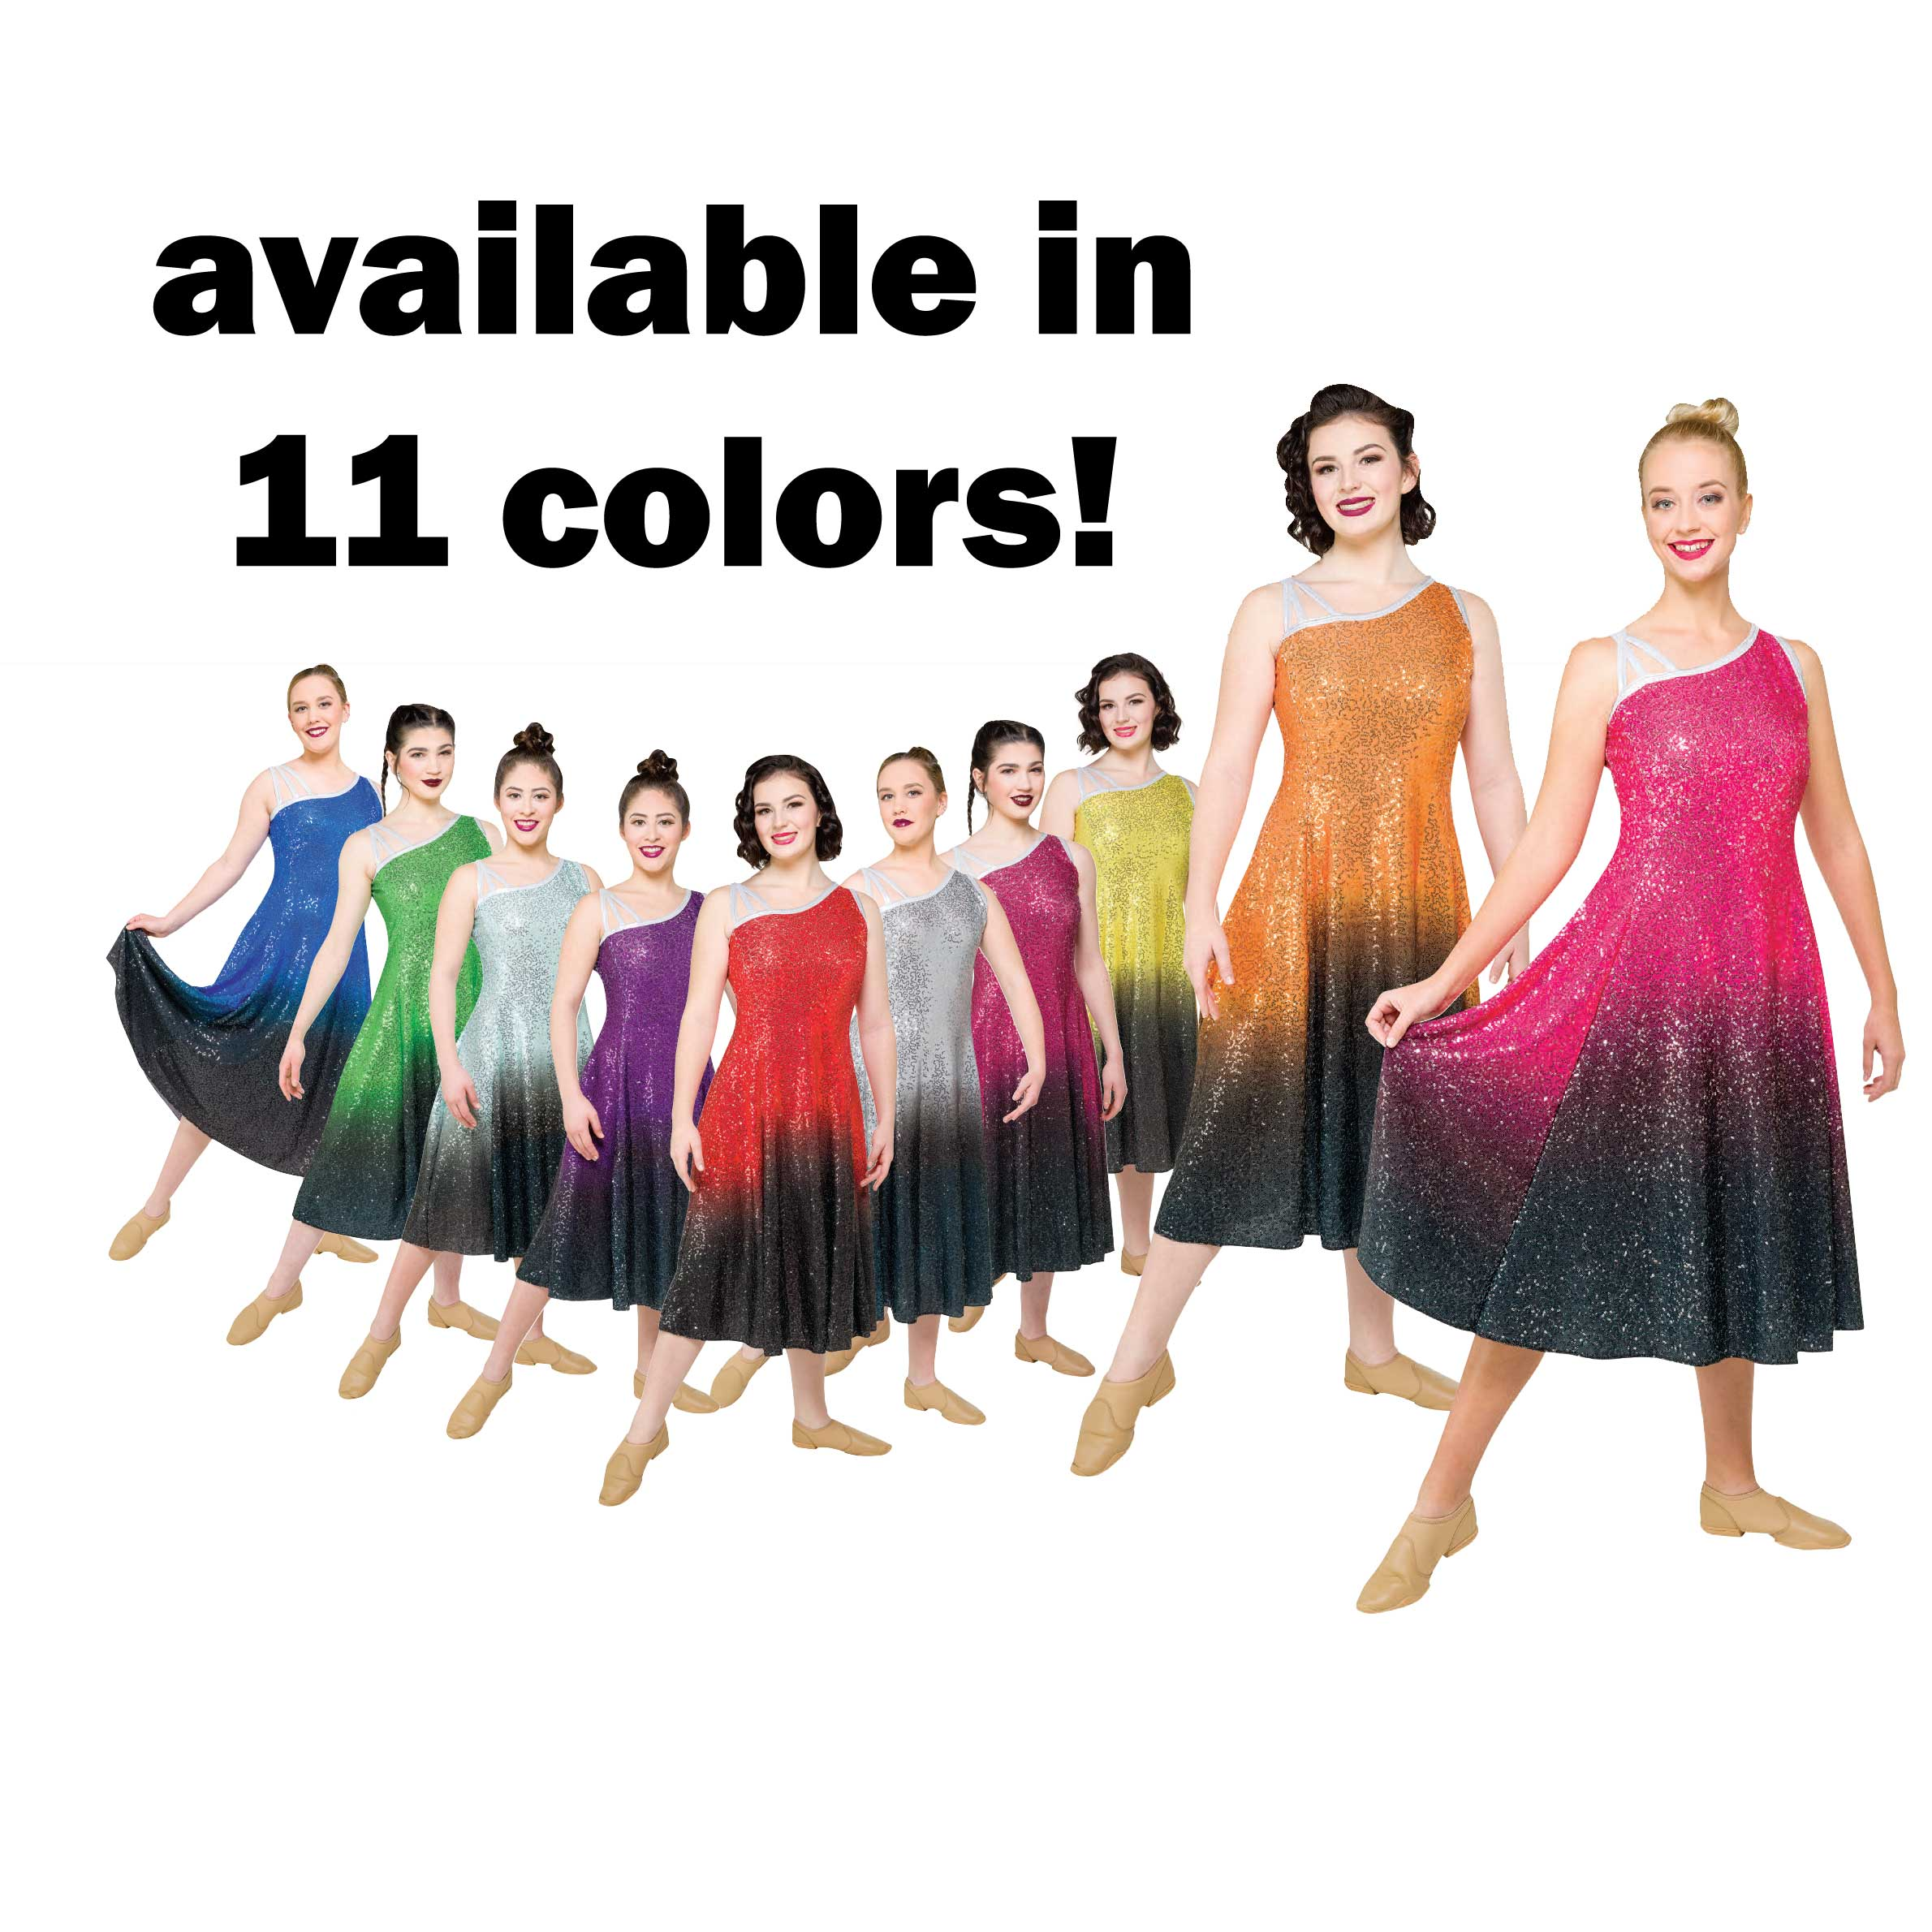 Guard Uniforms: Style 17002 Dress - Color to Black